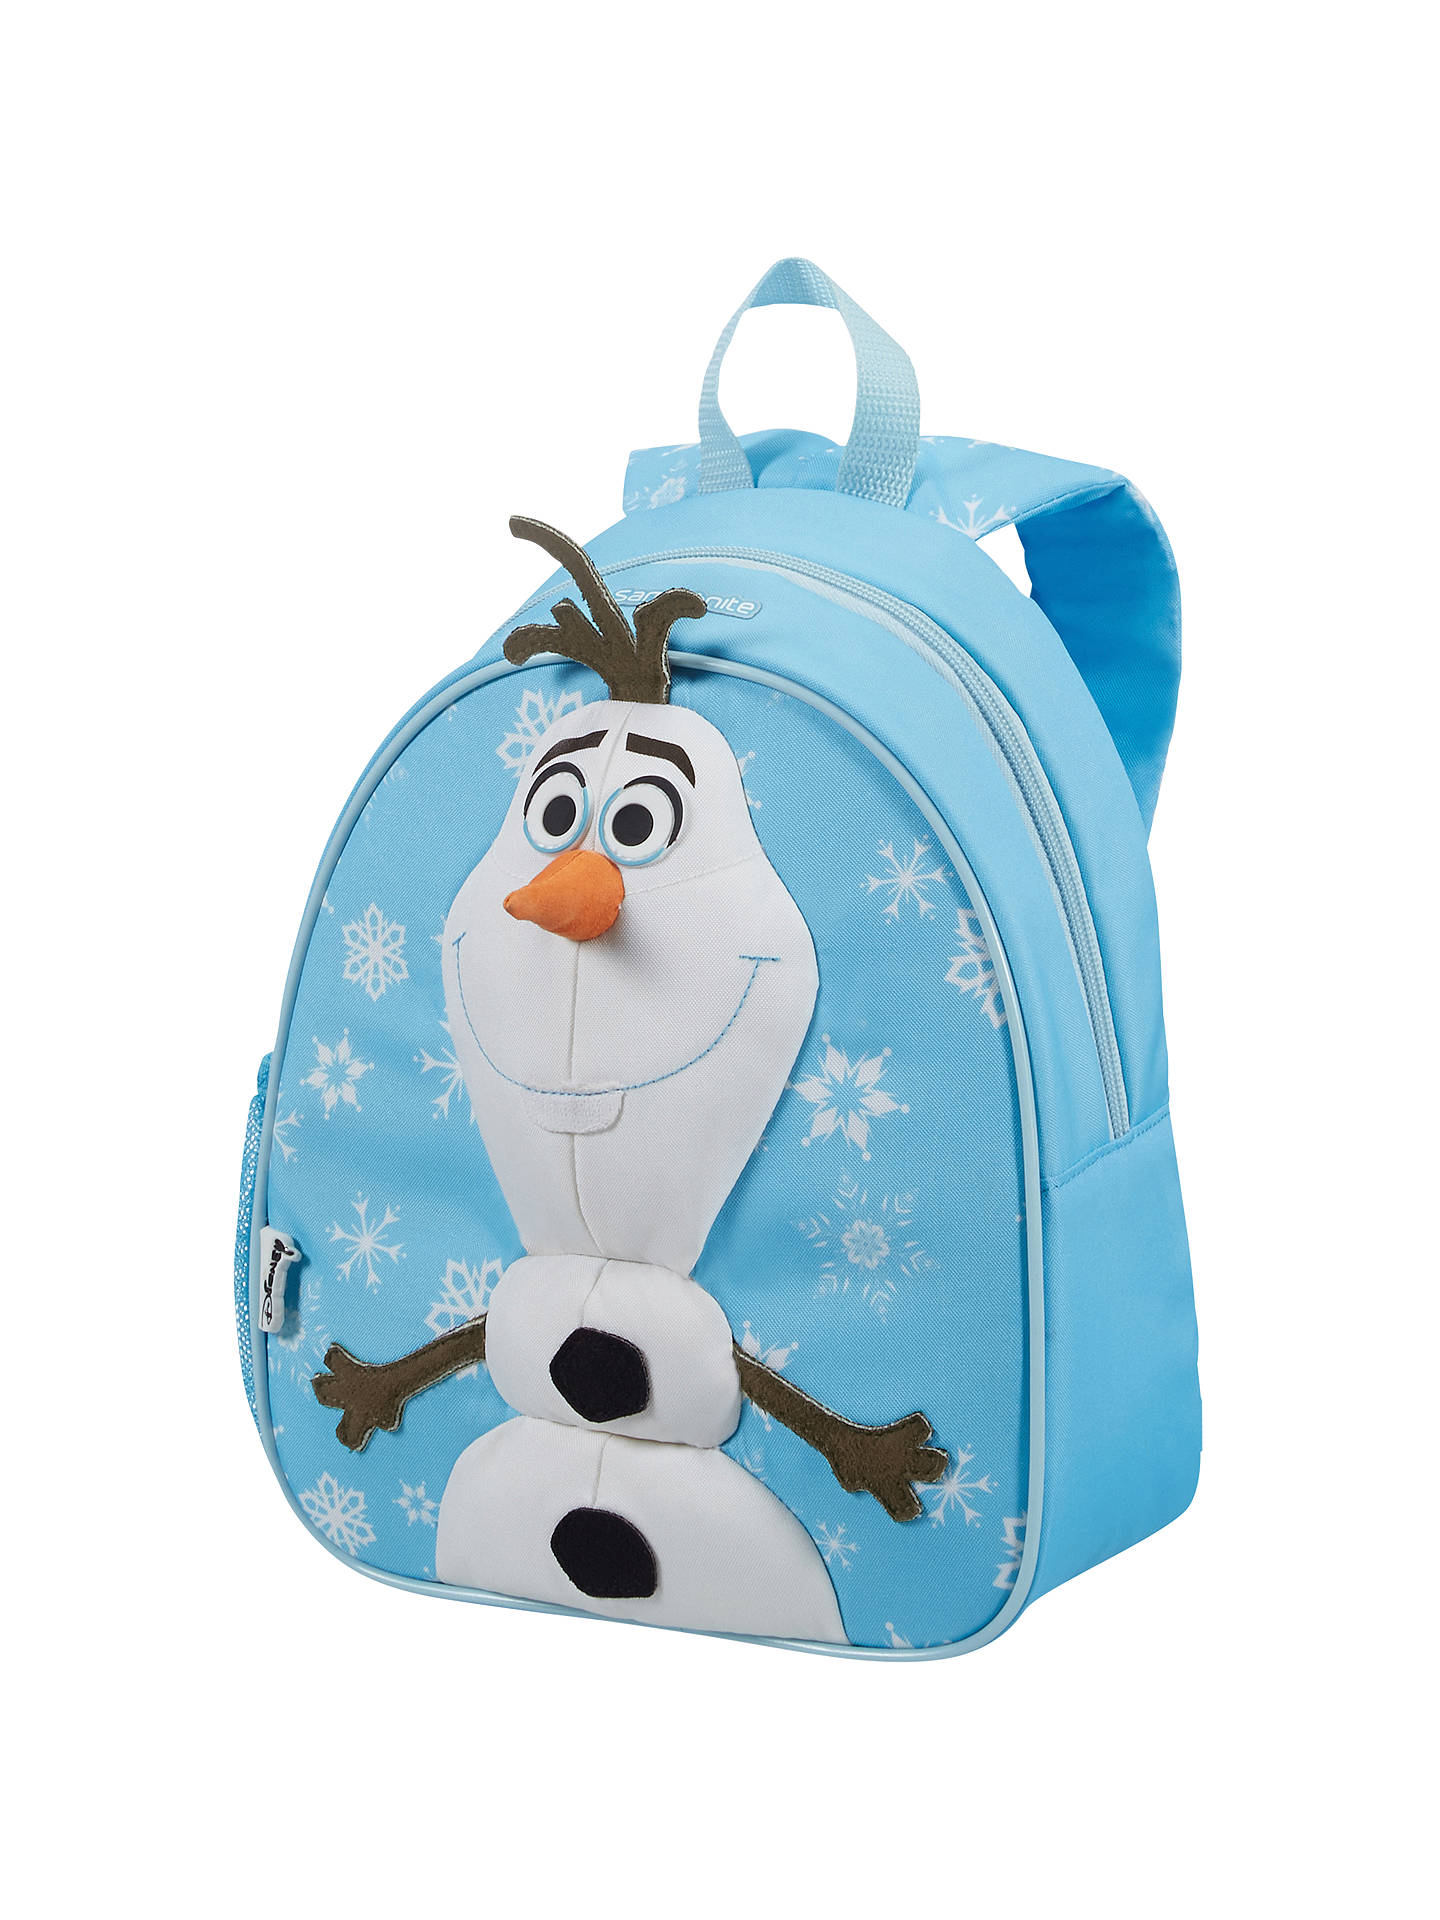 dc022d9bf6e Samsonite Disney Frozen Olaf Backpack